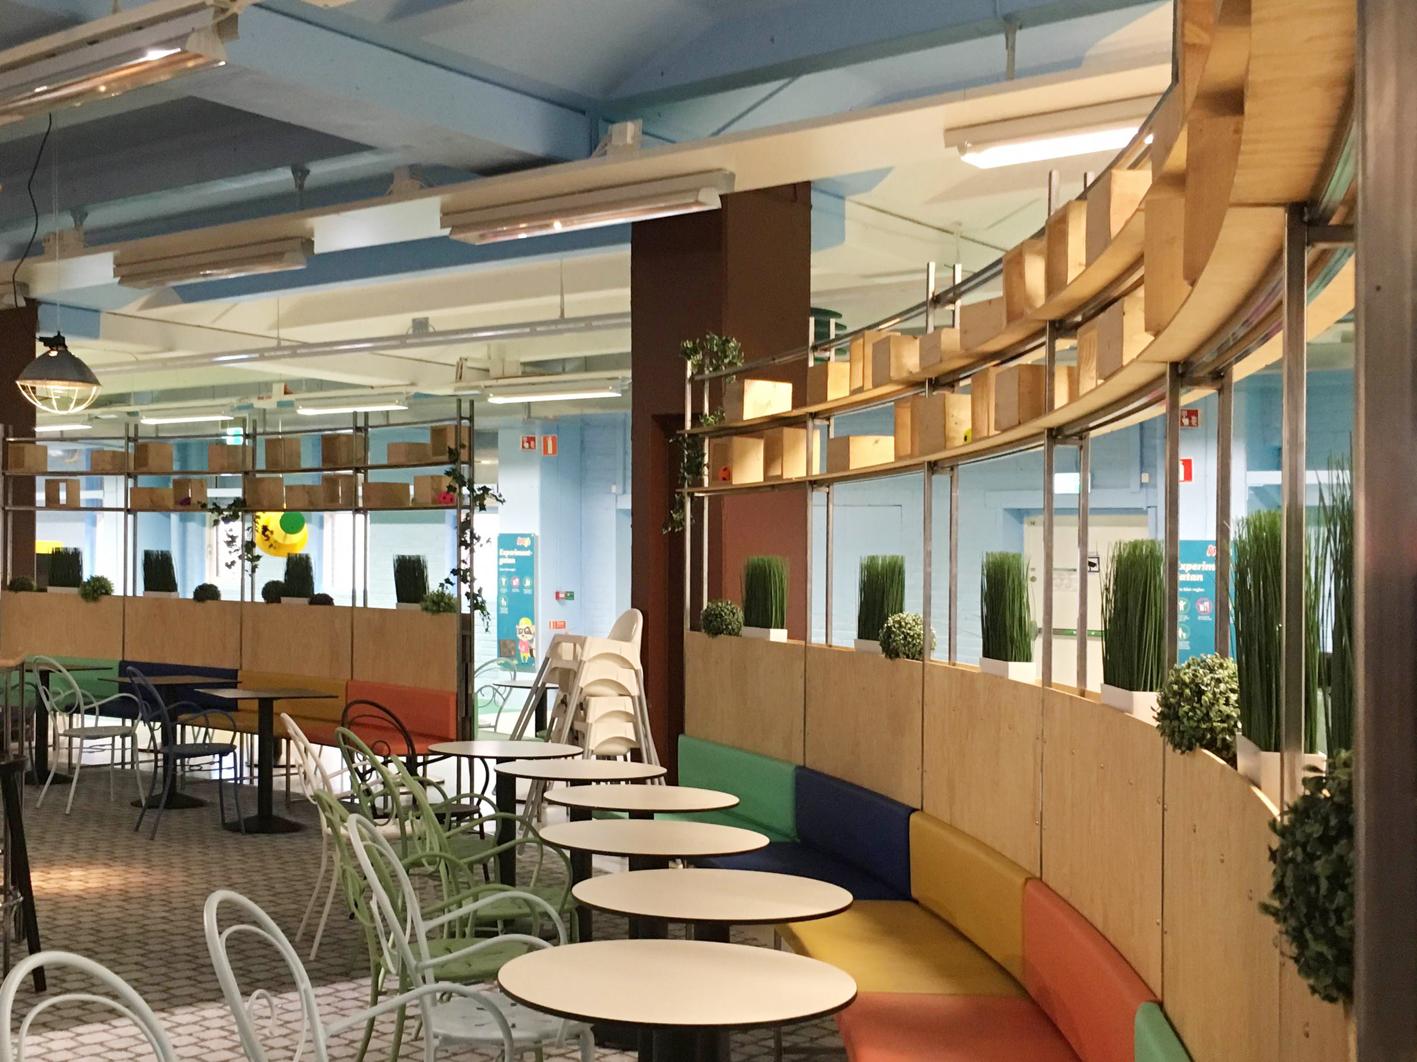 Restaurangen i Andys lekland i Stockholm, ritat av Rex Arkitektbyrå.